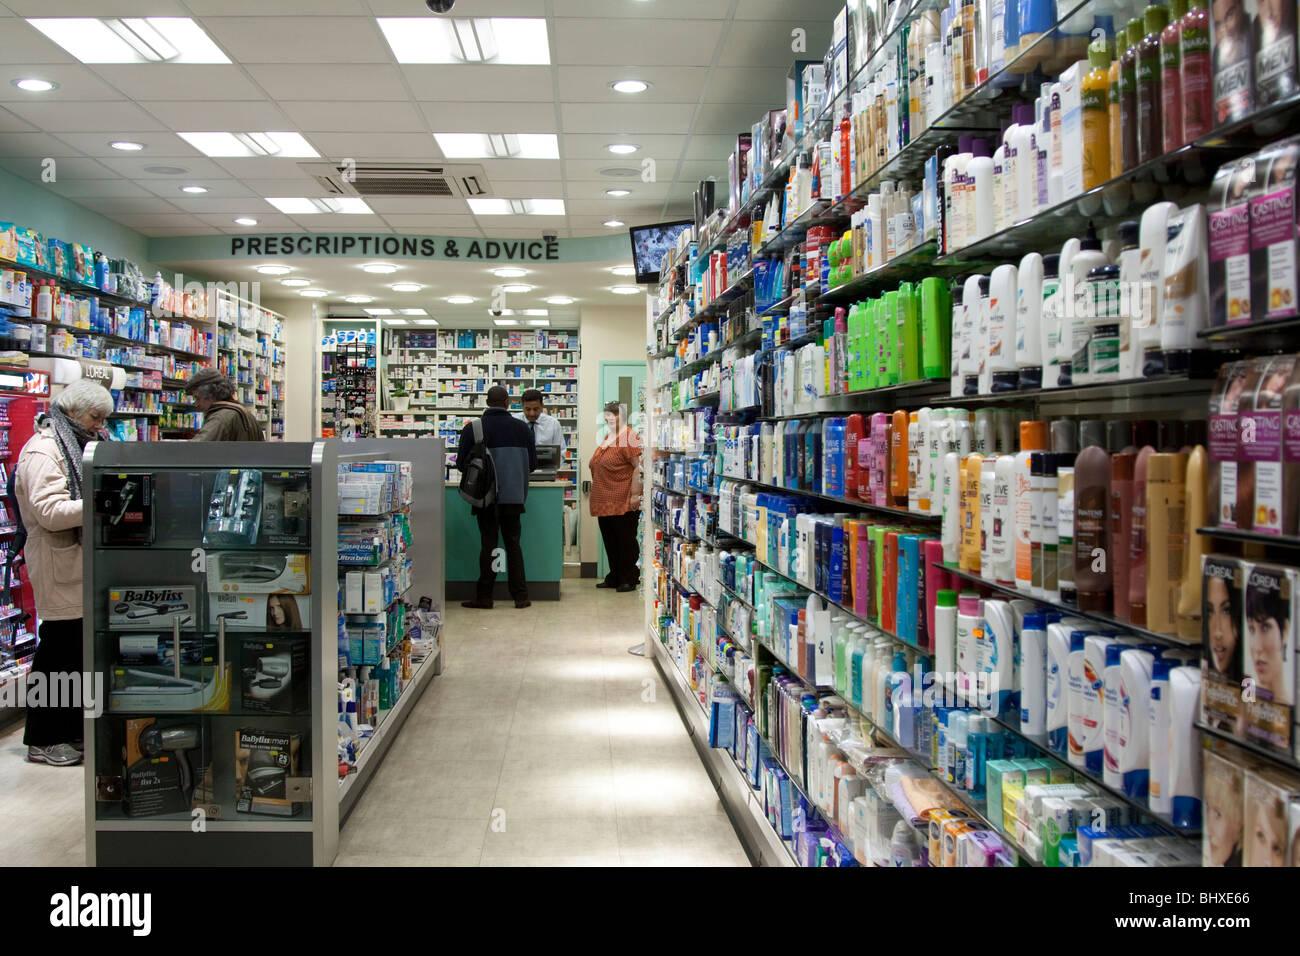 Chemist - Borough High Street - Southwark - London - Stock Image